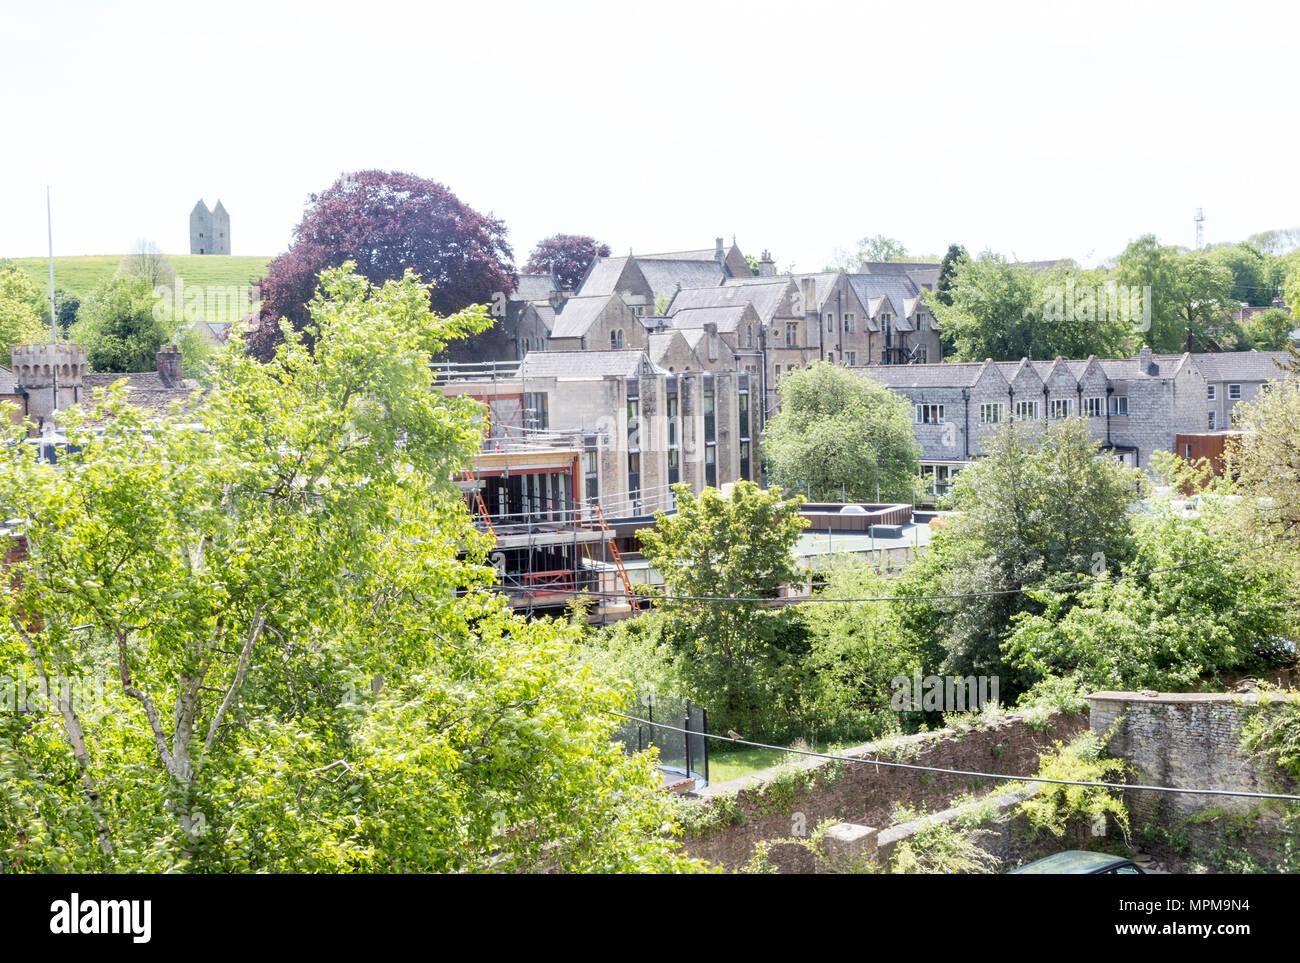 King's School, Bruton, Somerset, England, UK - Stock Image